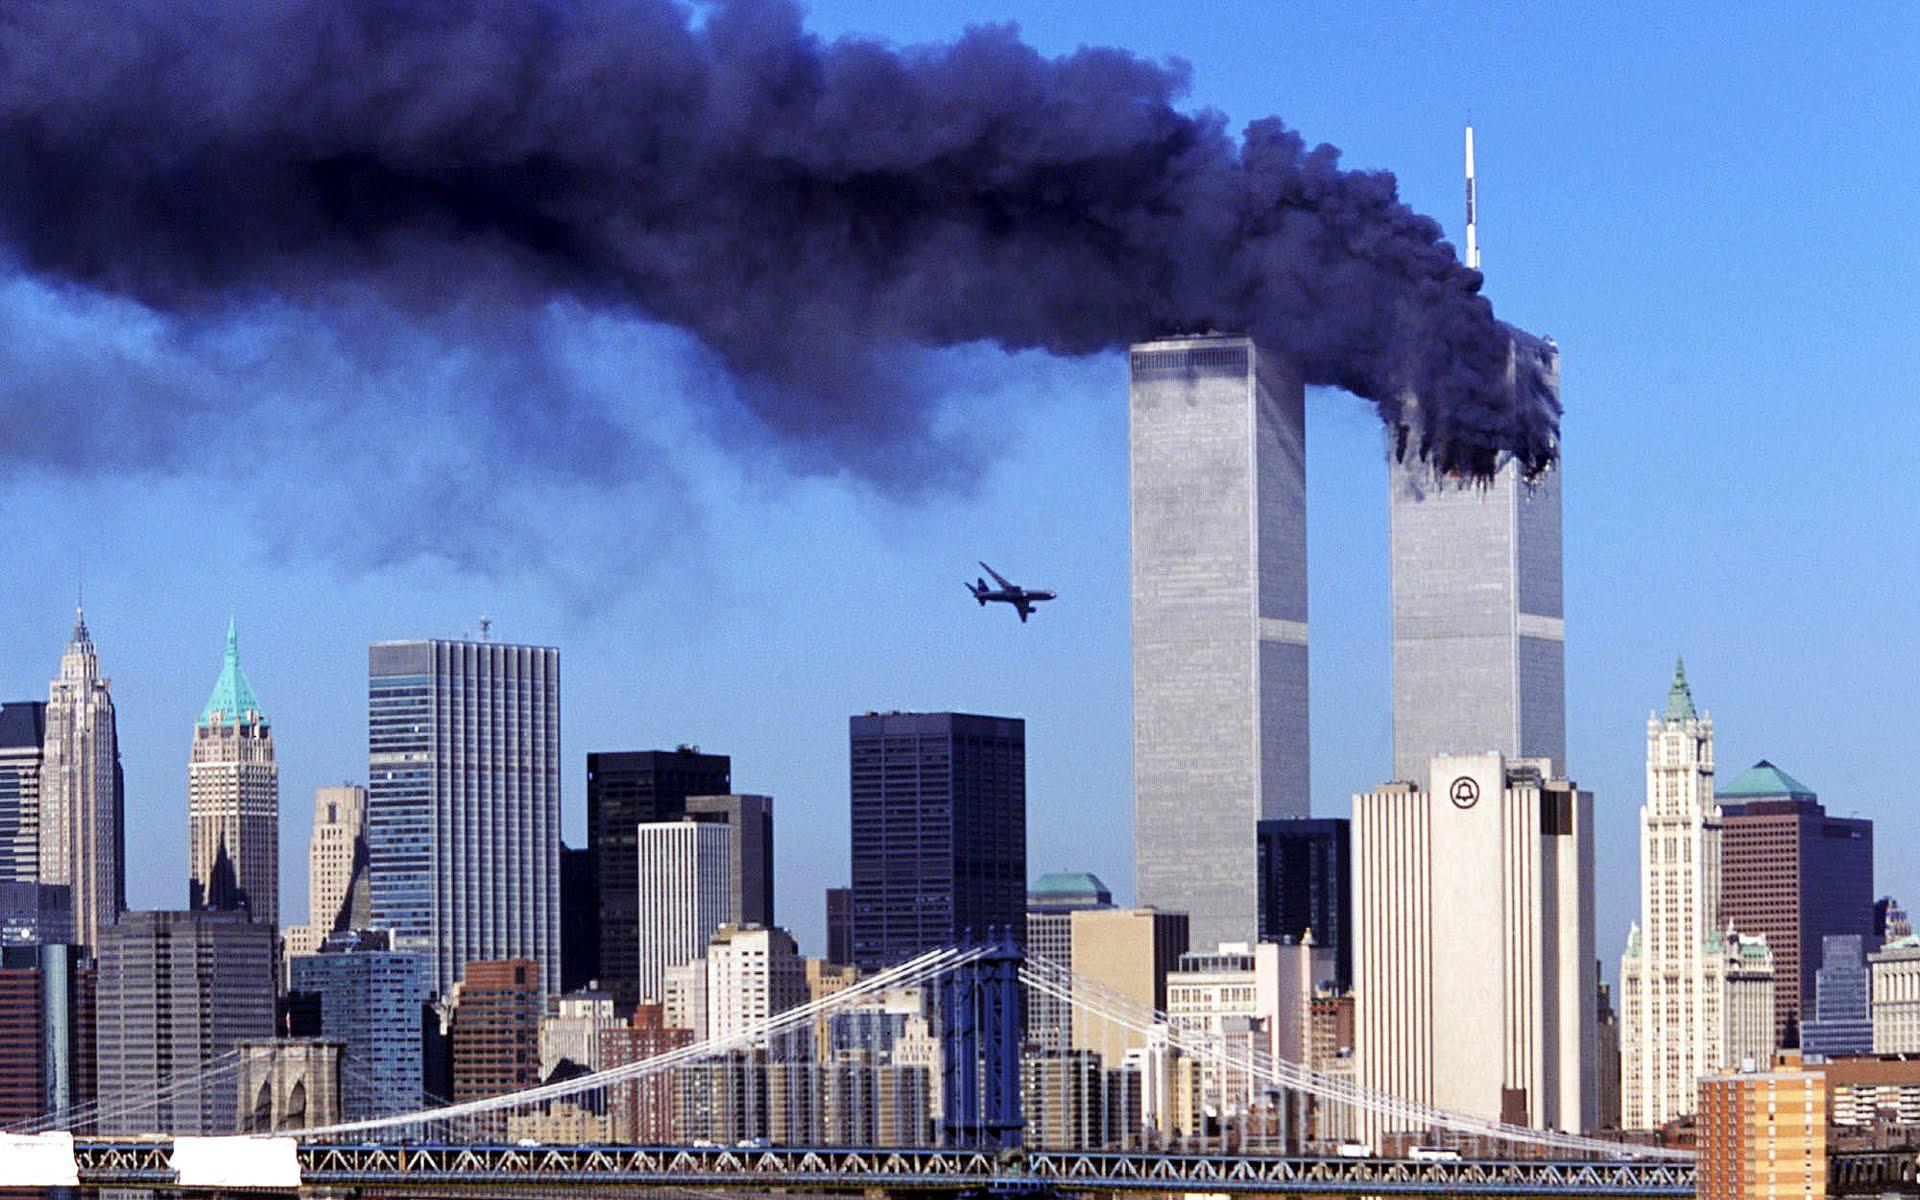 Suudi Arabistan'a 11 Eylül'le ilgili ilk dava